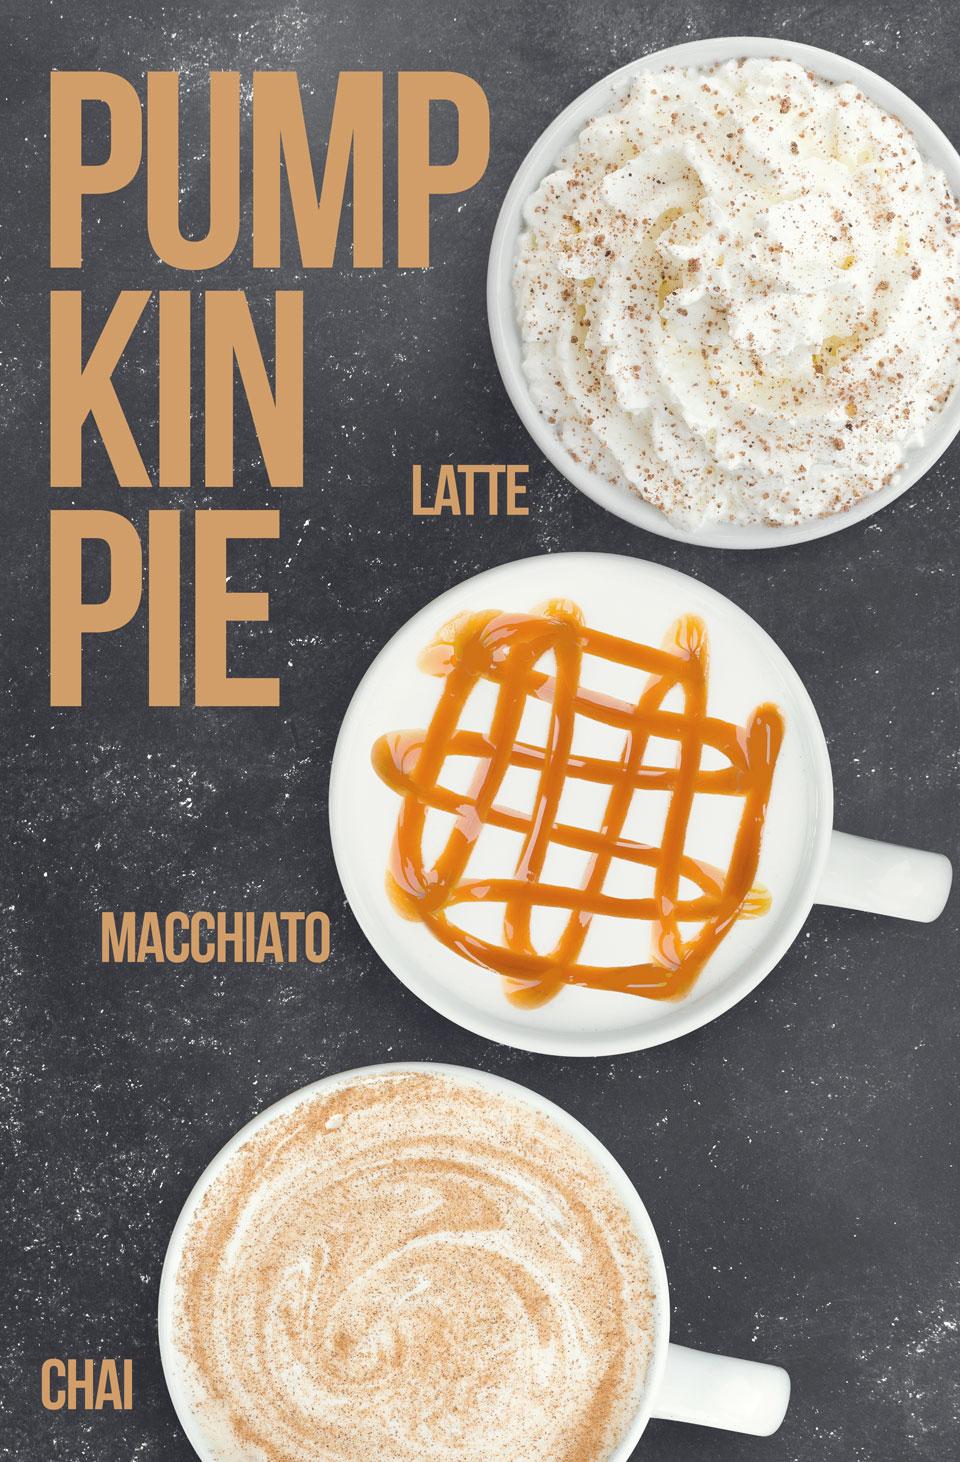 Fiddlers Coffee - Pumpkin Pie - 2015 tall